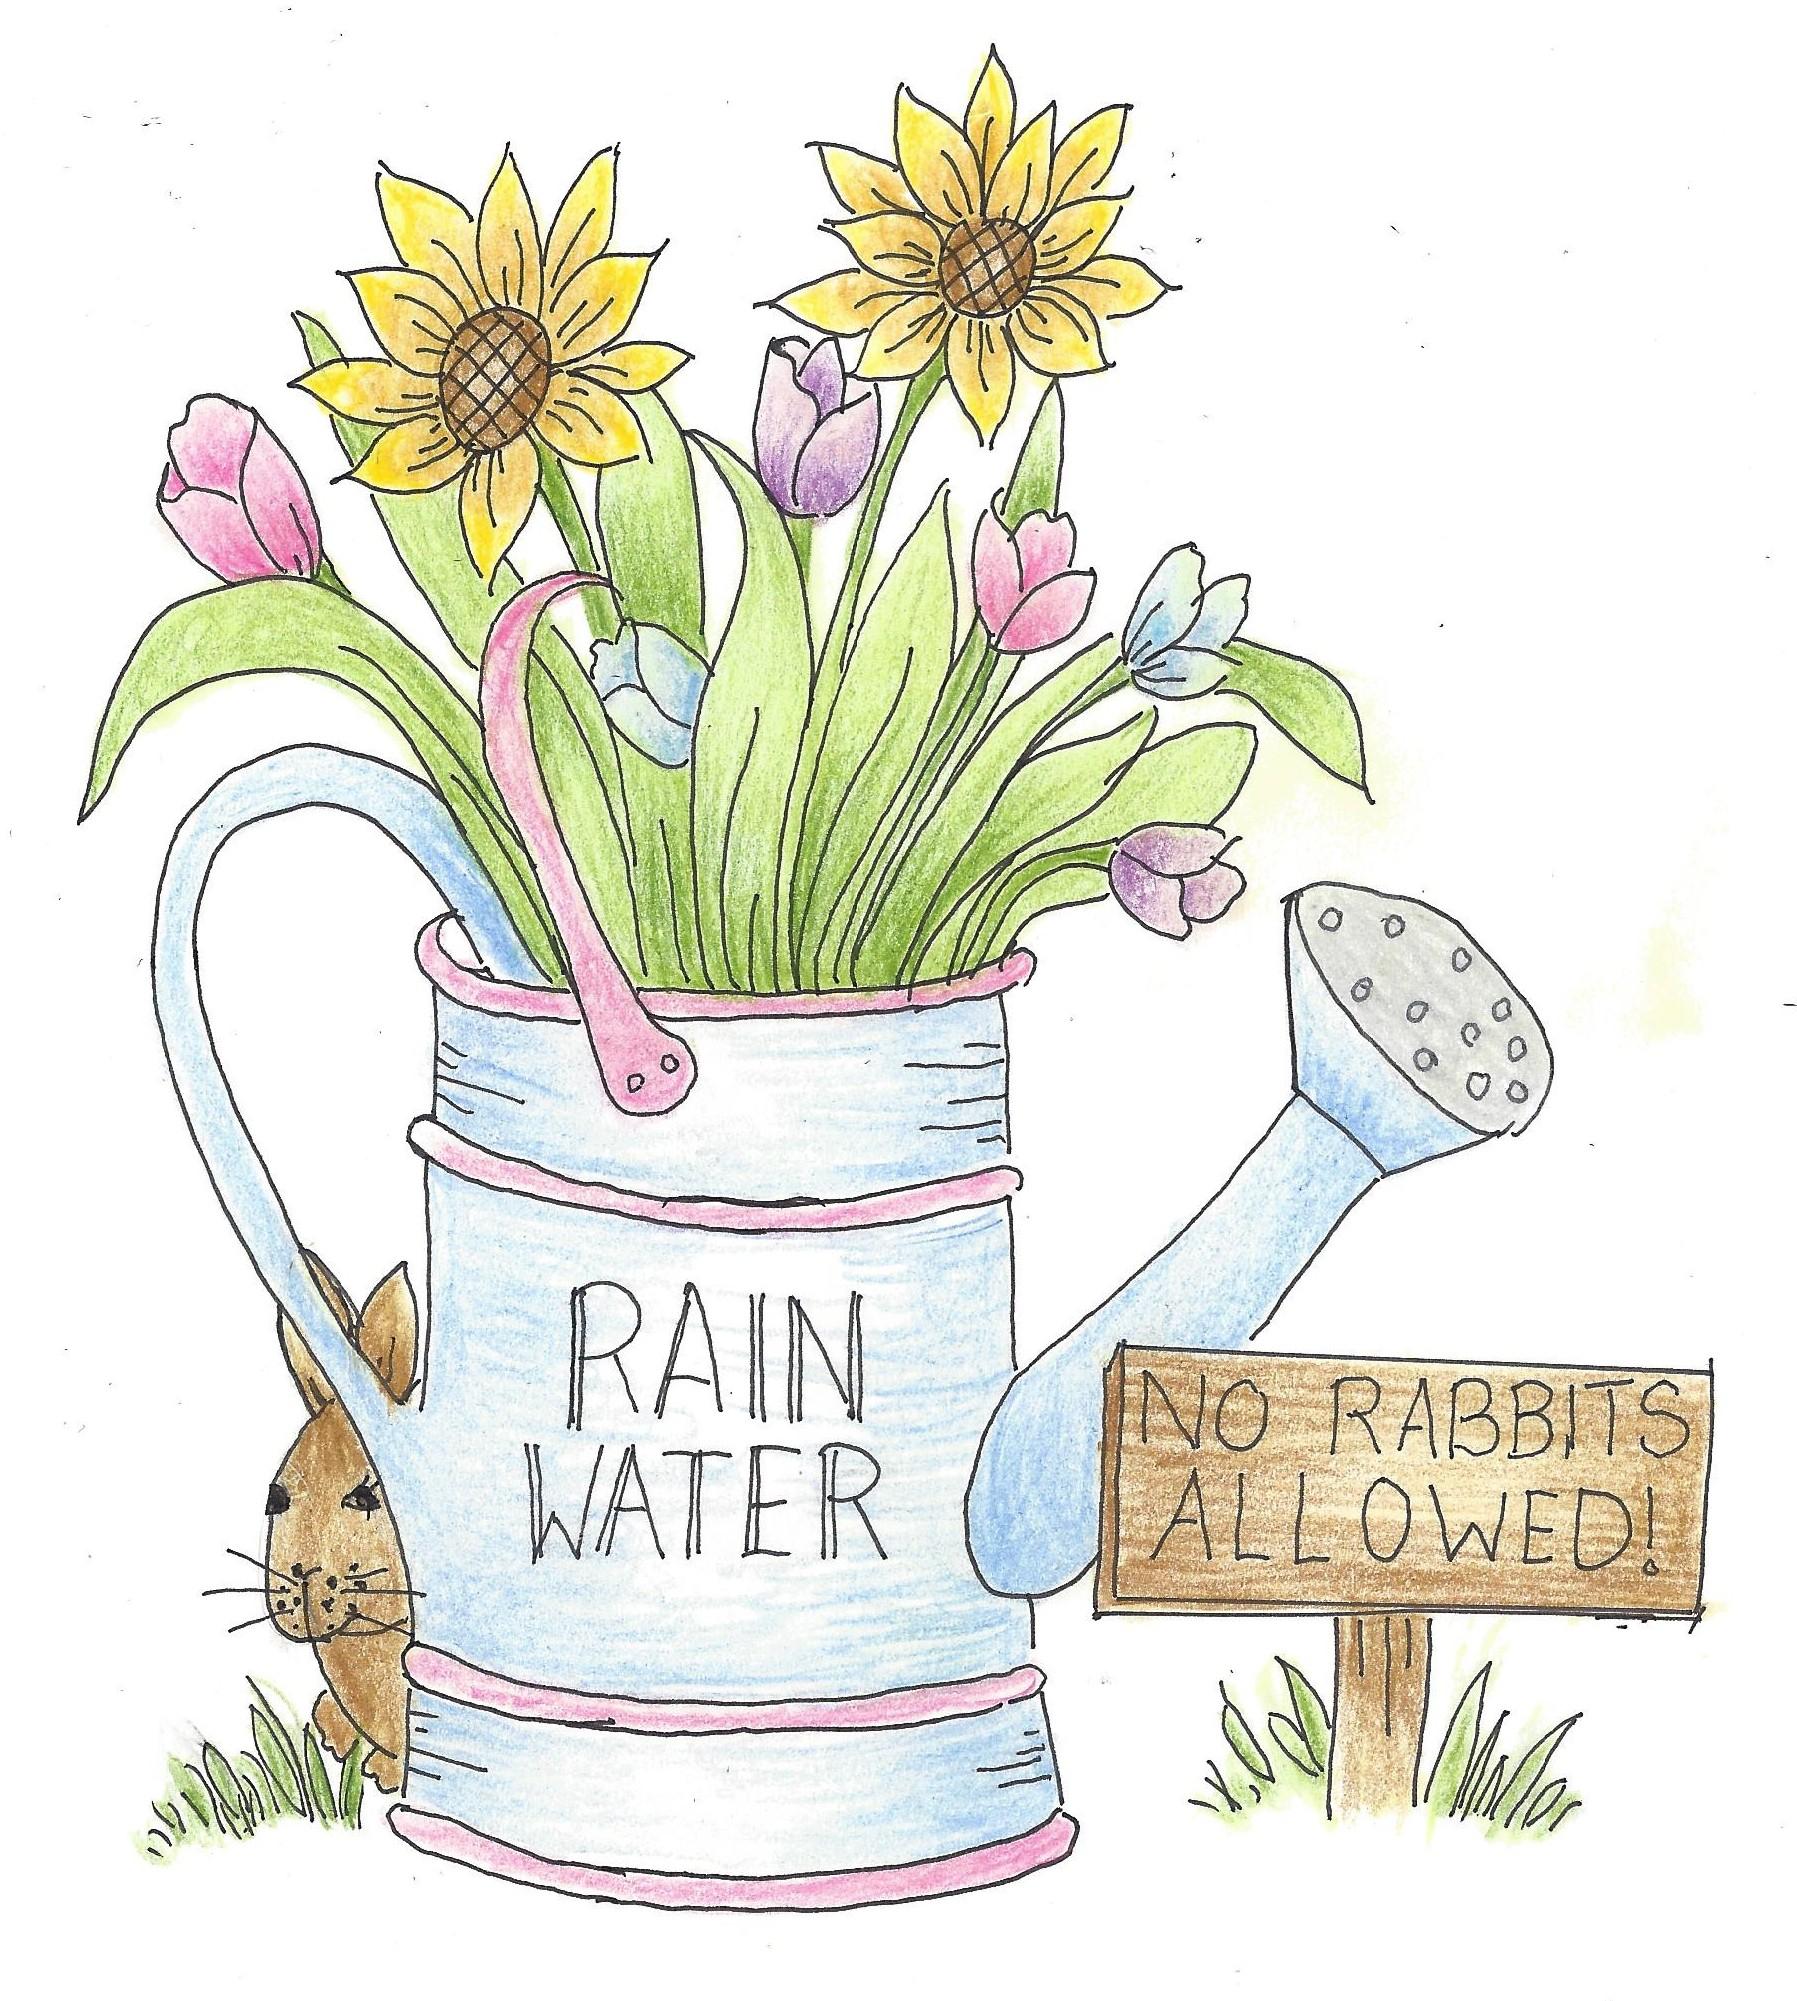 CL011 Rain Water